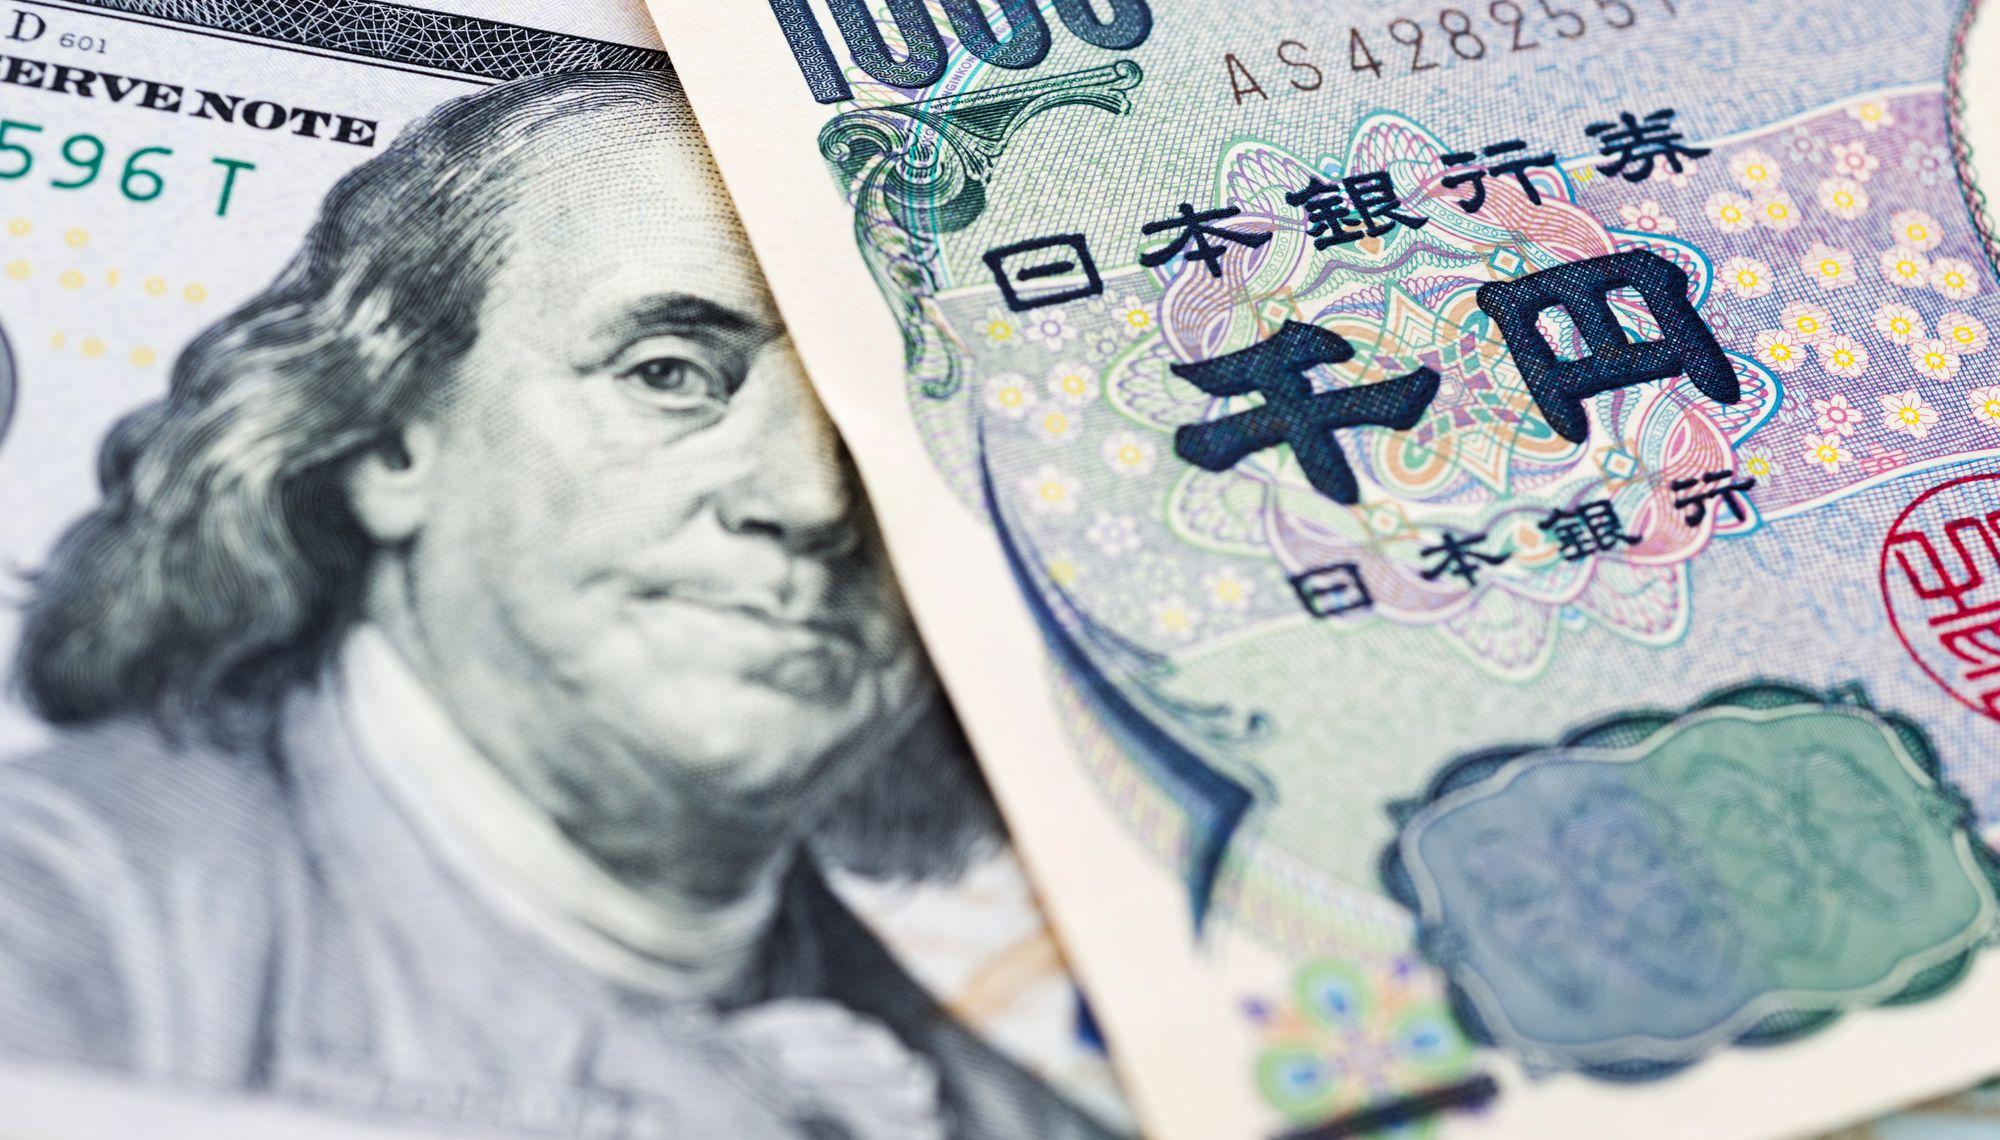 FXOpen美元和日元品种外汇保证金恢复